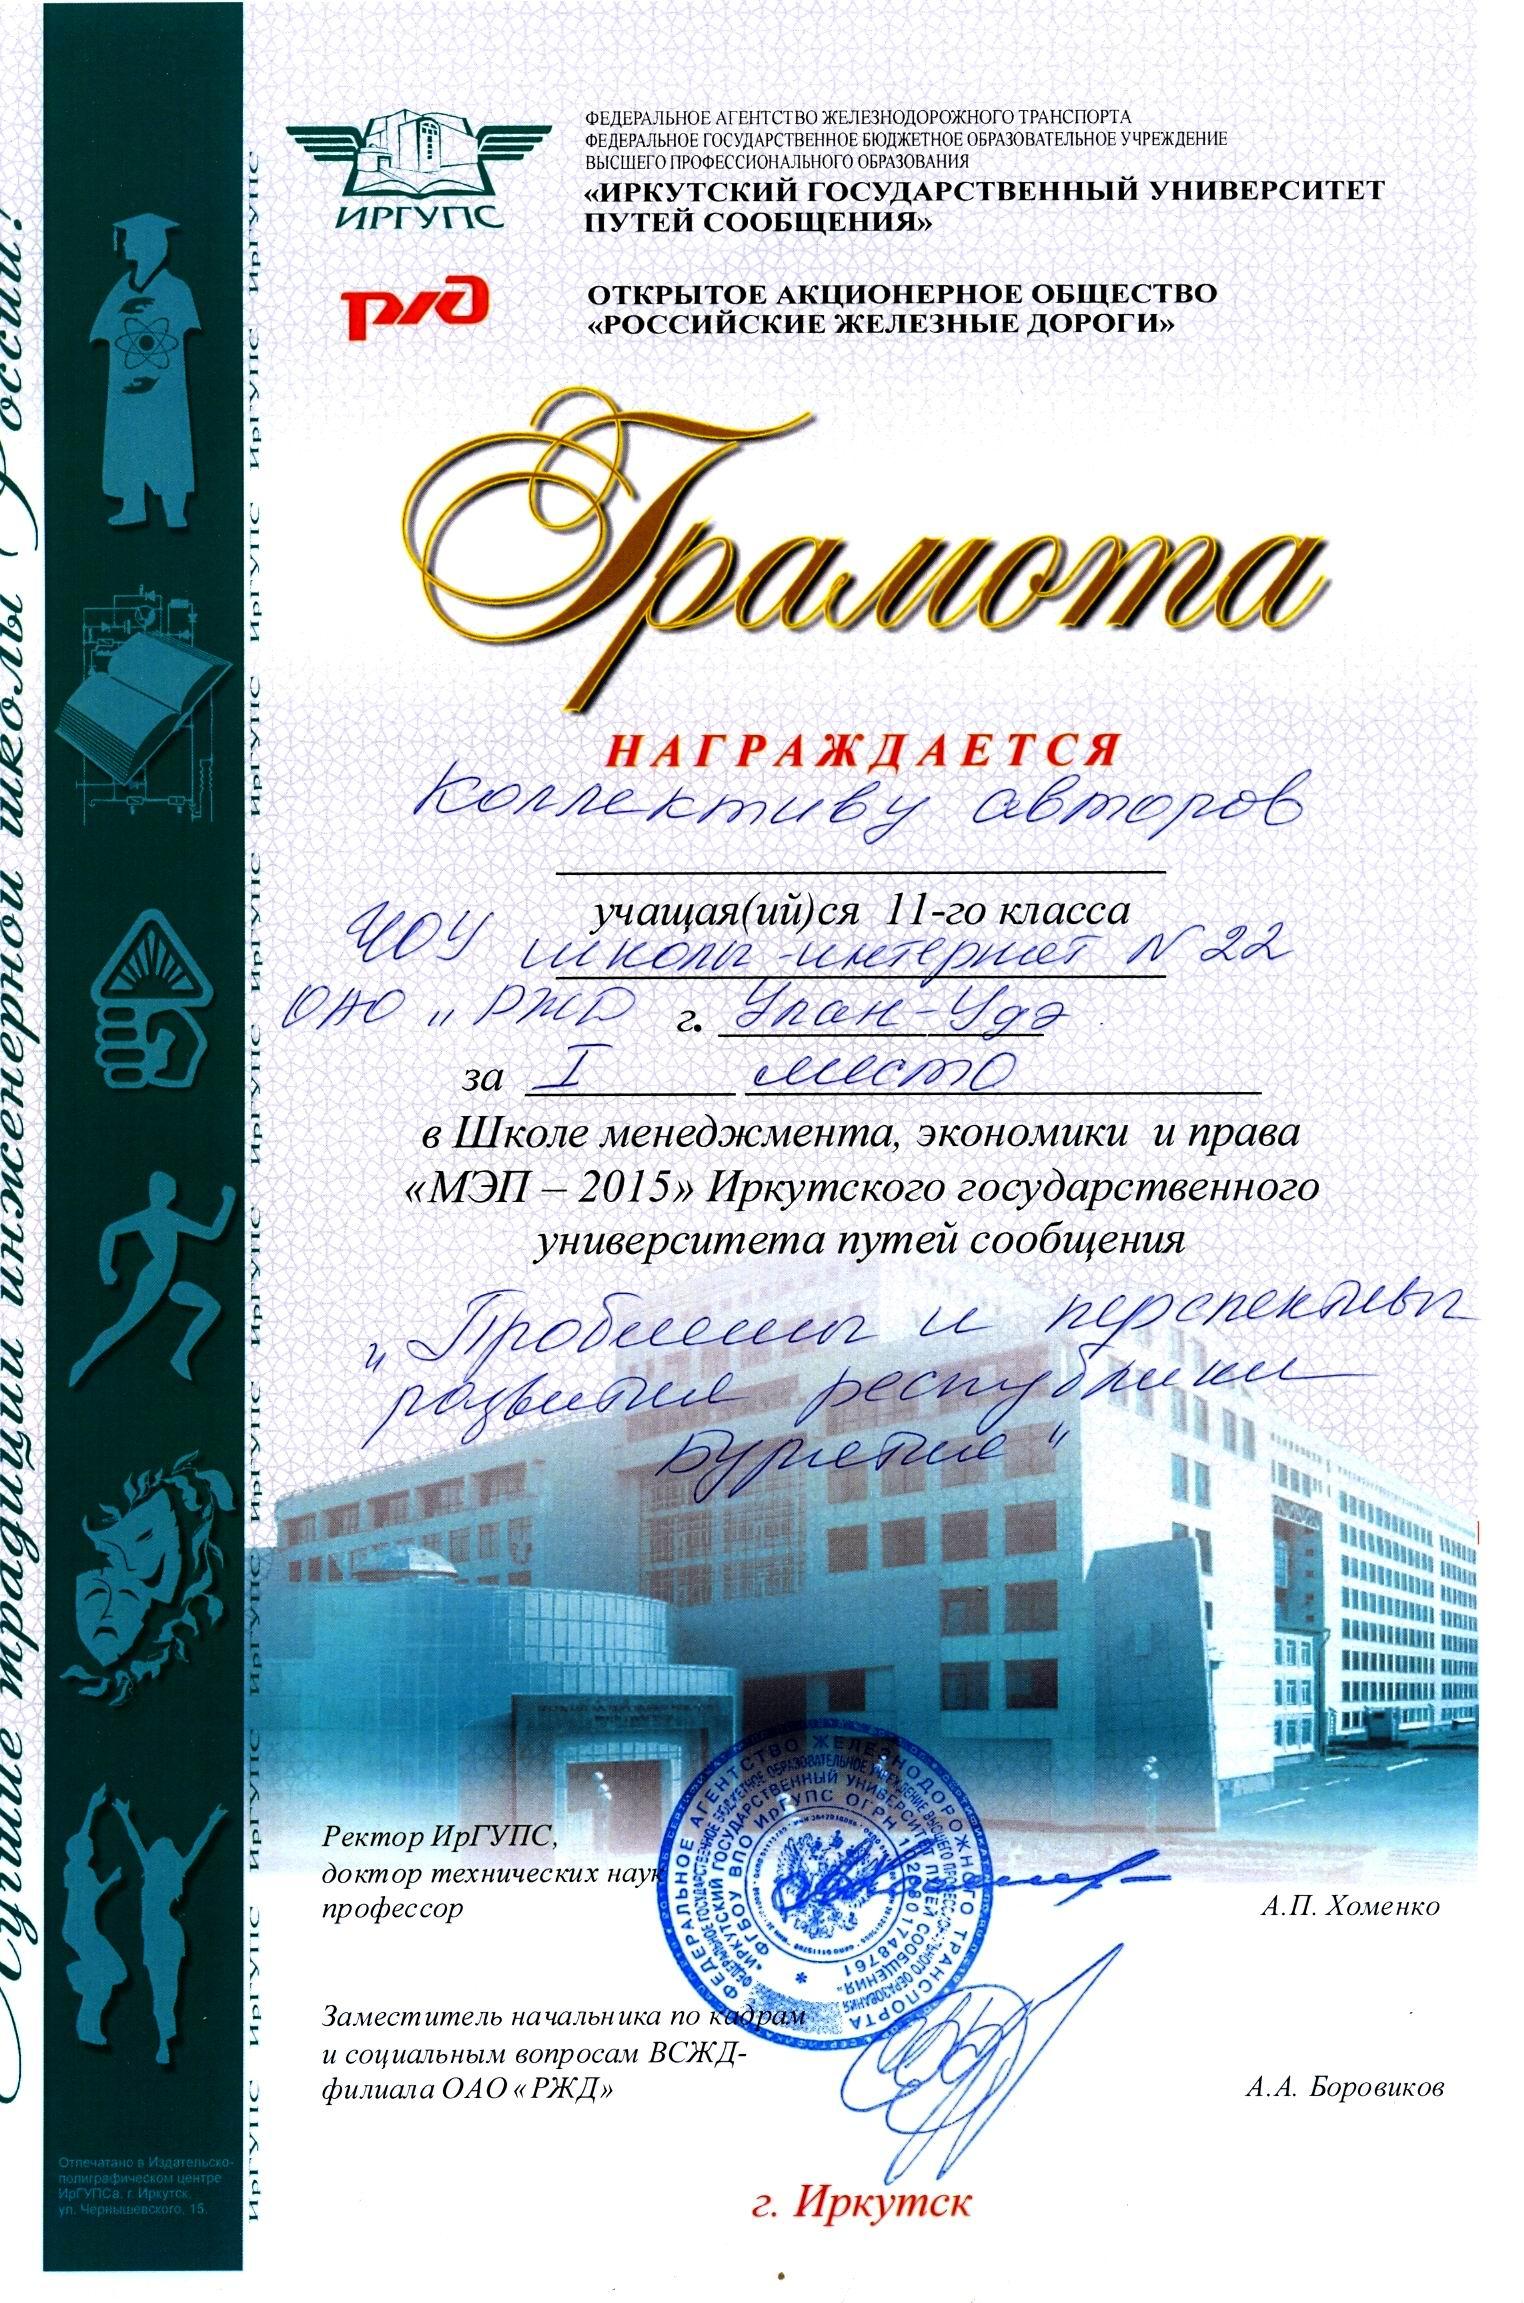 Команад школы-интернат №22 ГРАМОТА 1 м